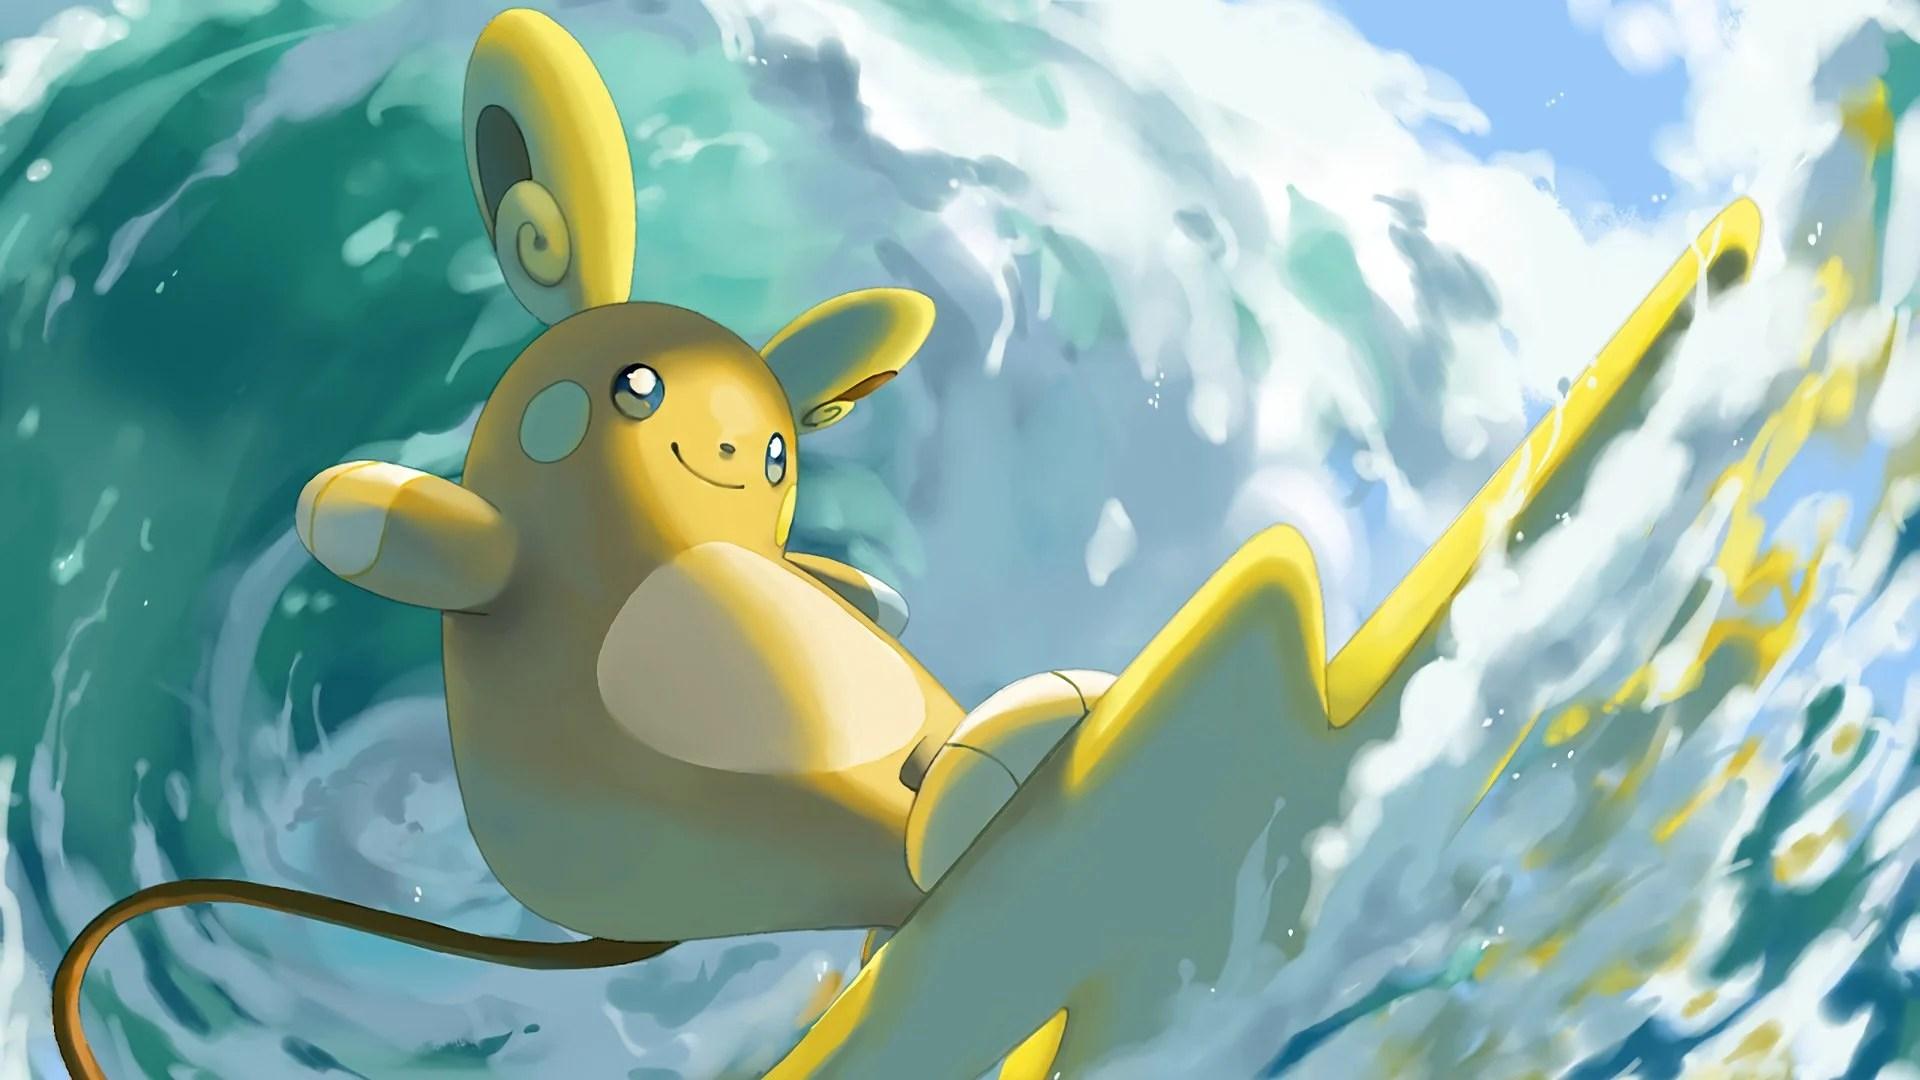 Cute Wallpaper For Iphone Hd Alola Raichu Raid Boss Guide Pokemon Go Hub